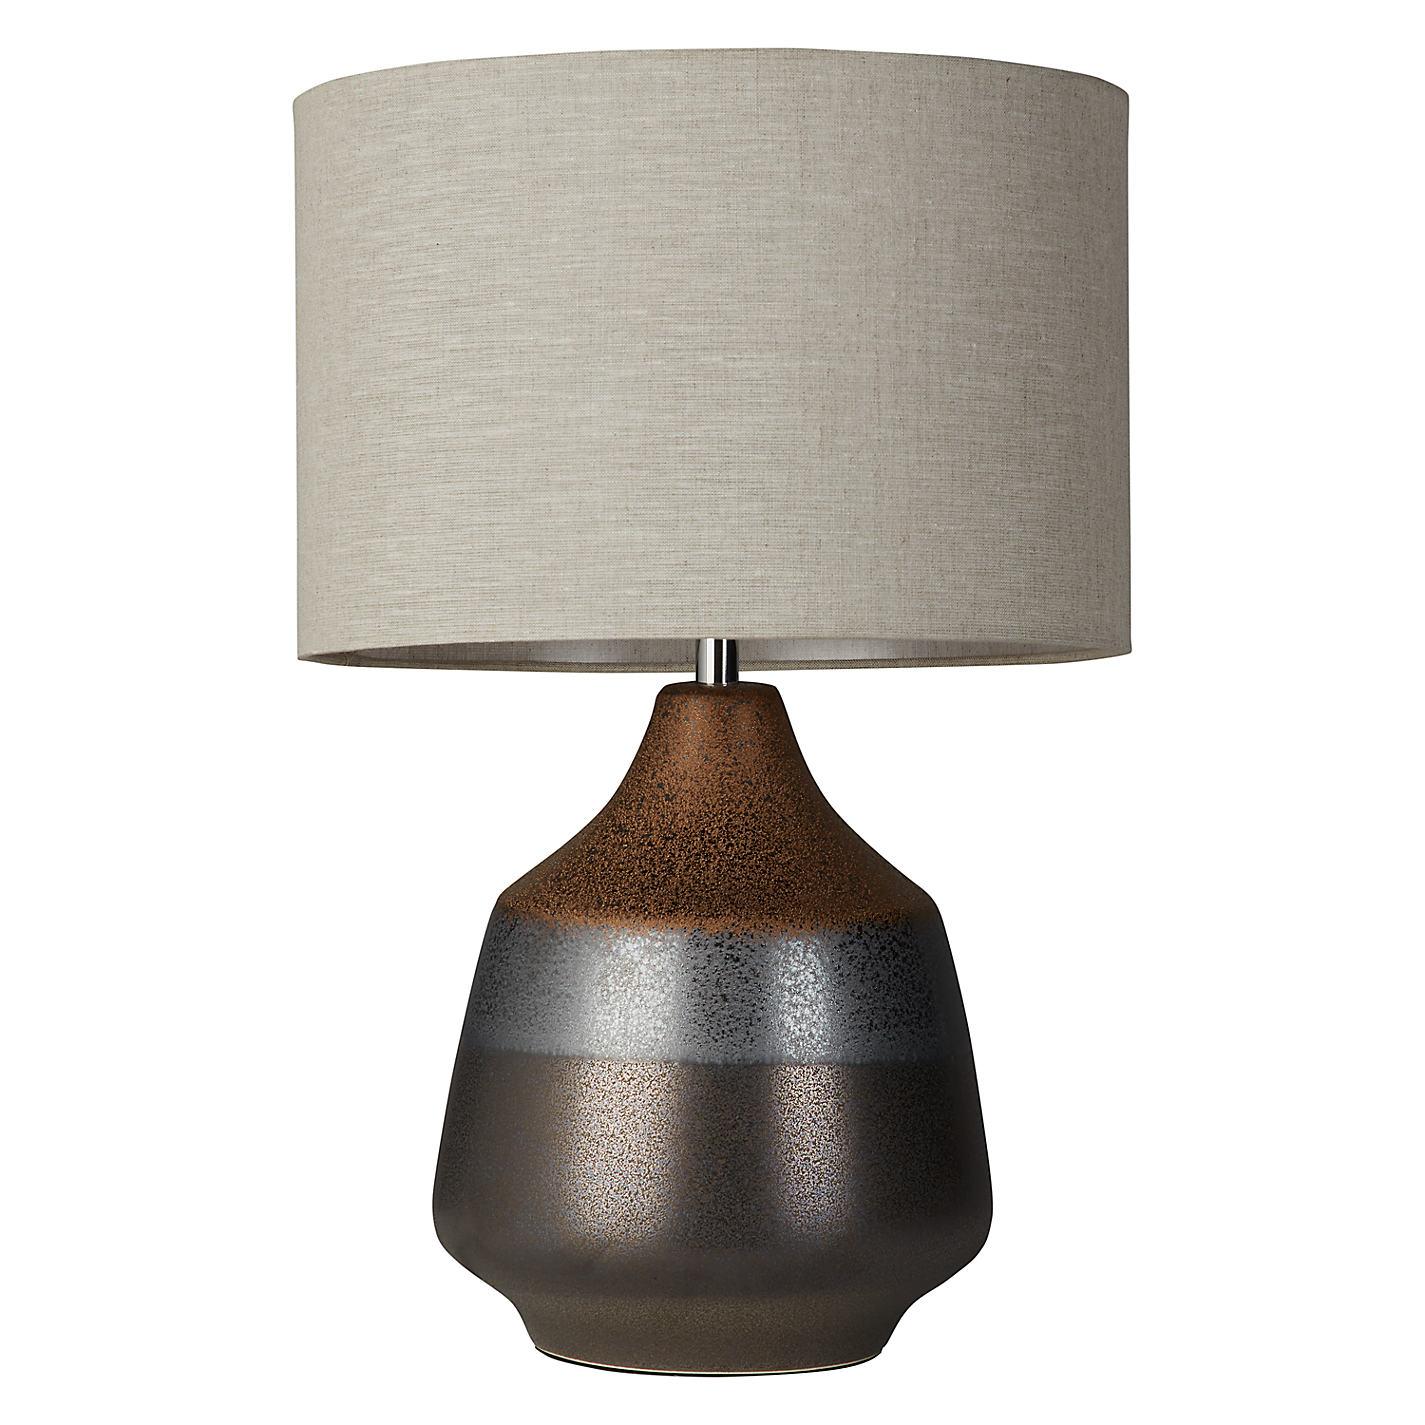 Buy john lewis delaney metallic 2 glaze ceramic table lamp bronze buy john lewis delaney metallic 2 glaze ceramic table lamp bronze online at johnlewis geotapseo Image collections